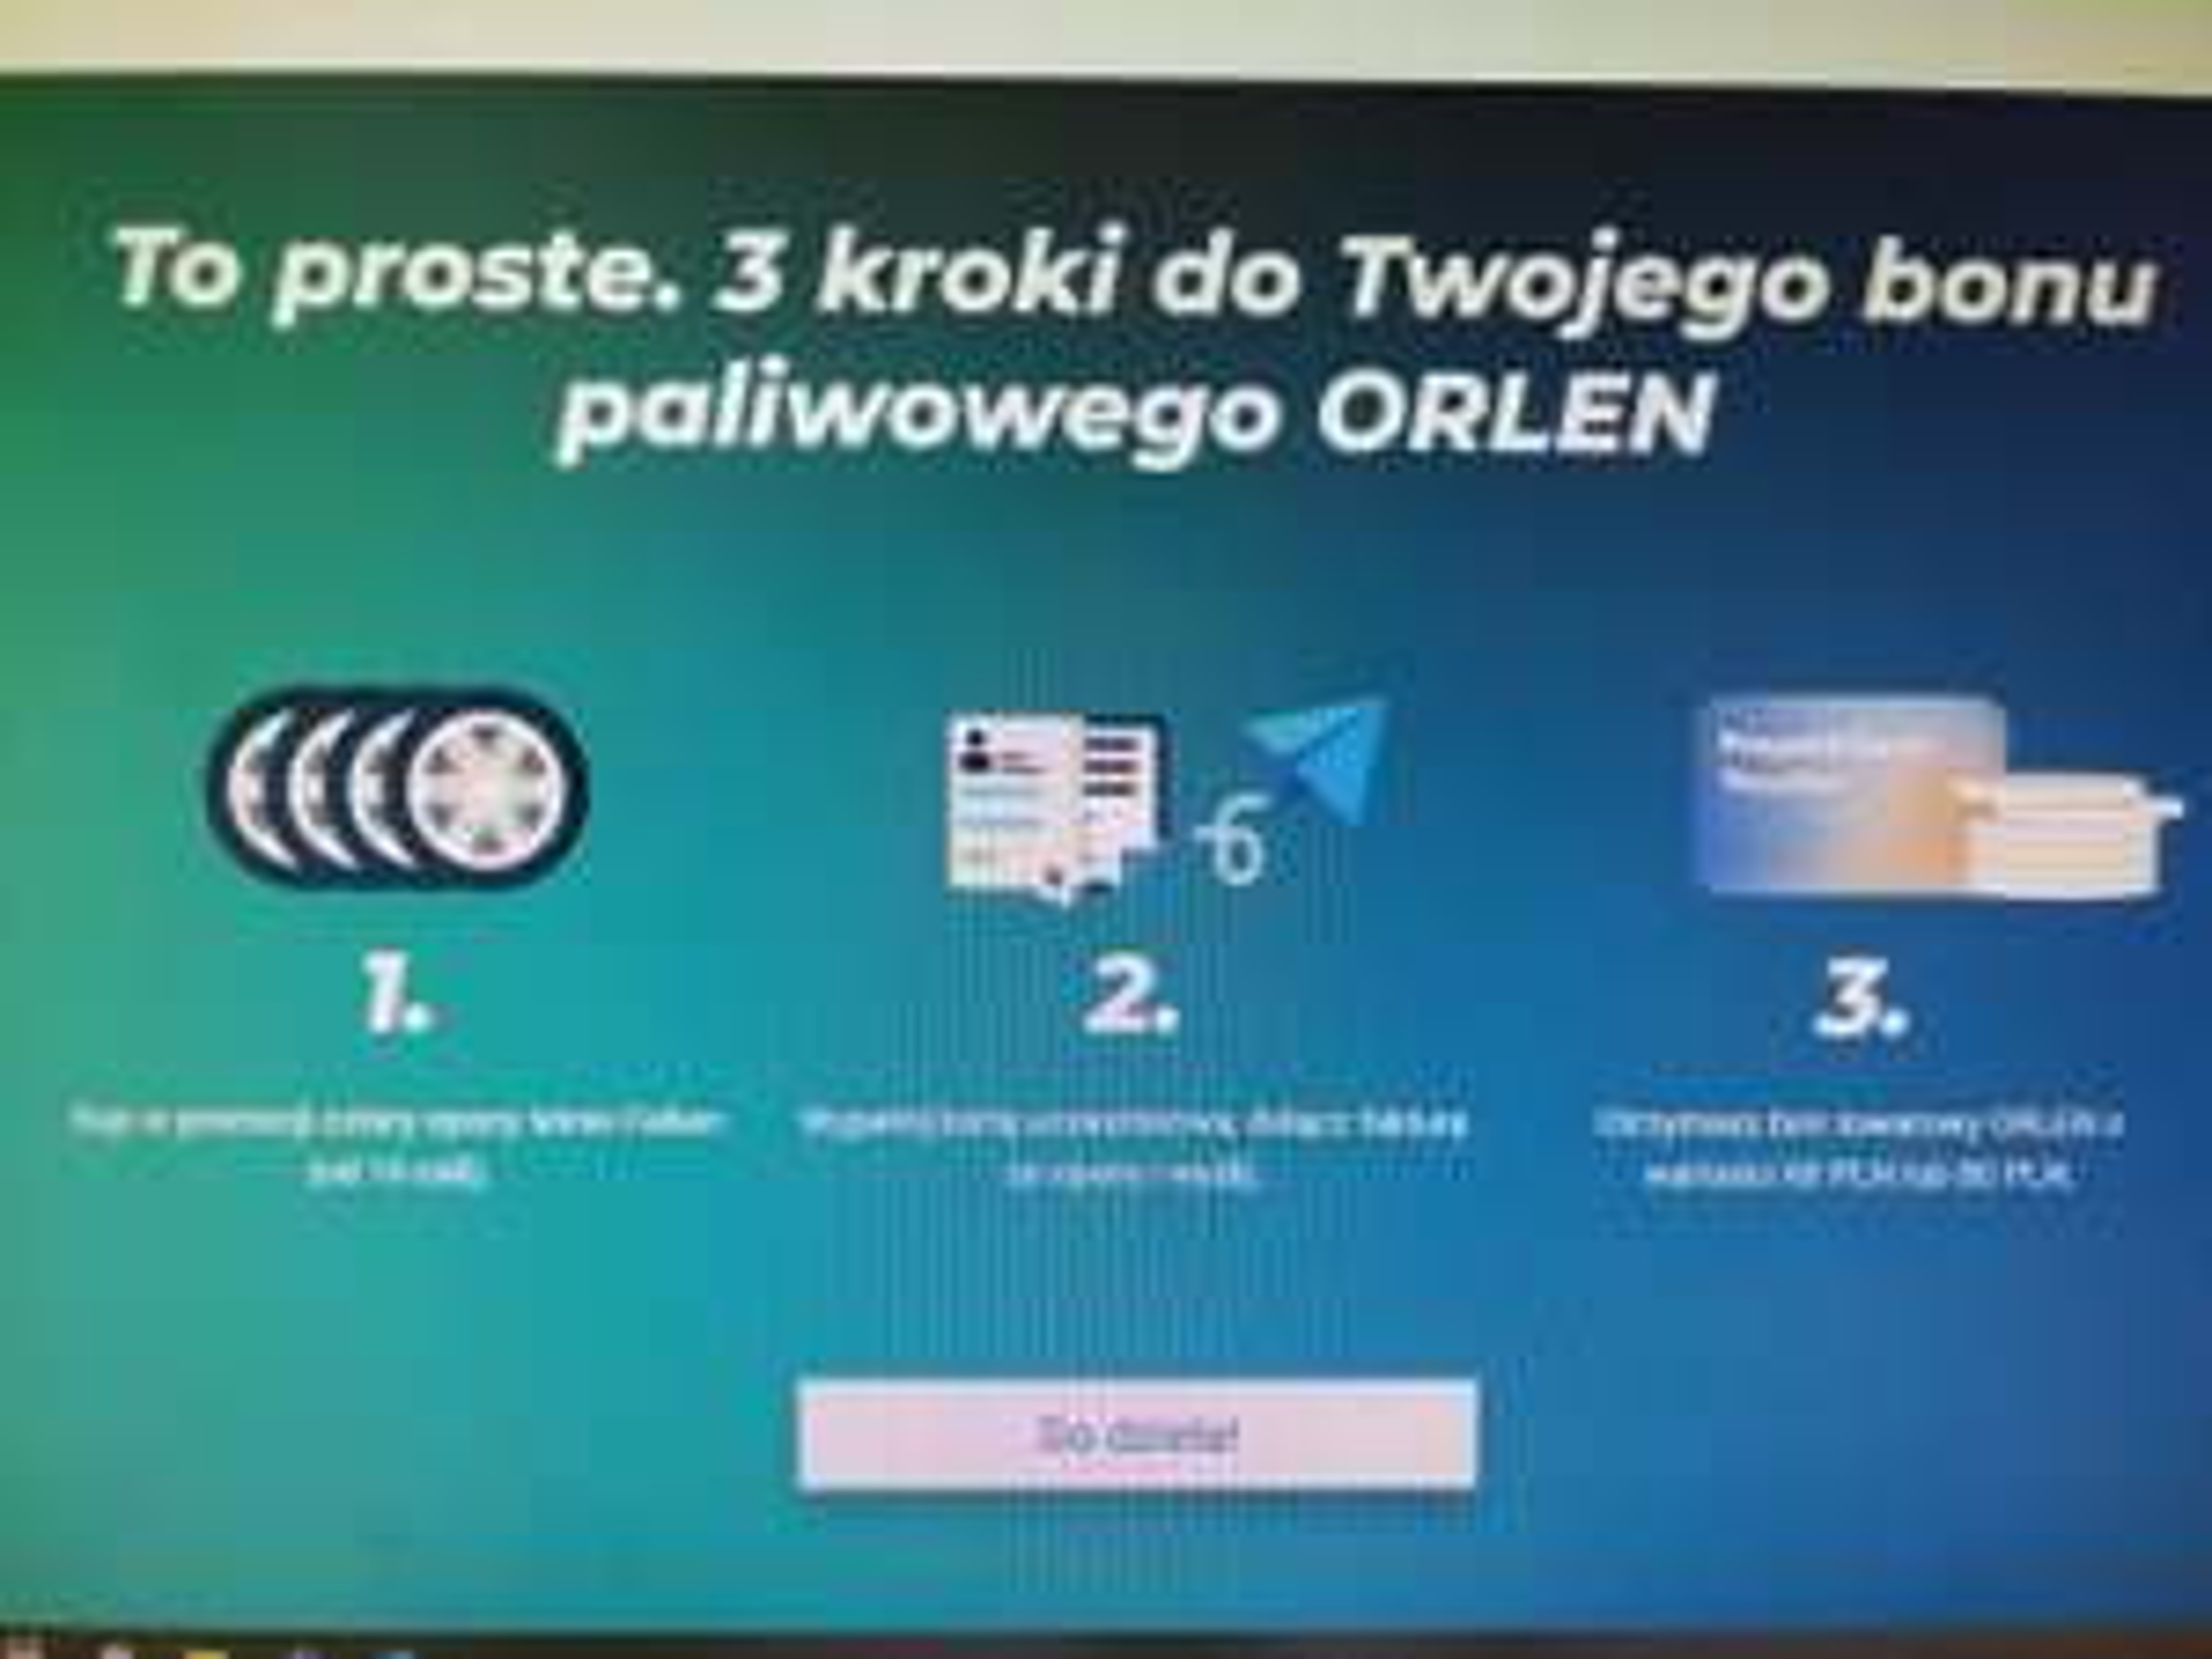 Bon ORLEN / Bliska za zakup kompletu letnich opon Falken od 16 cali